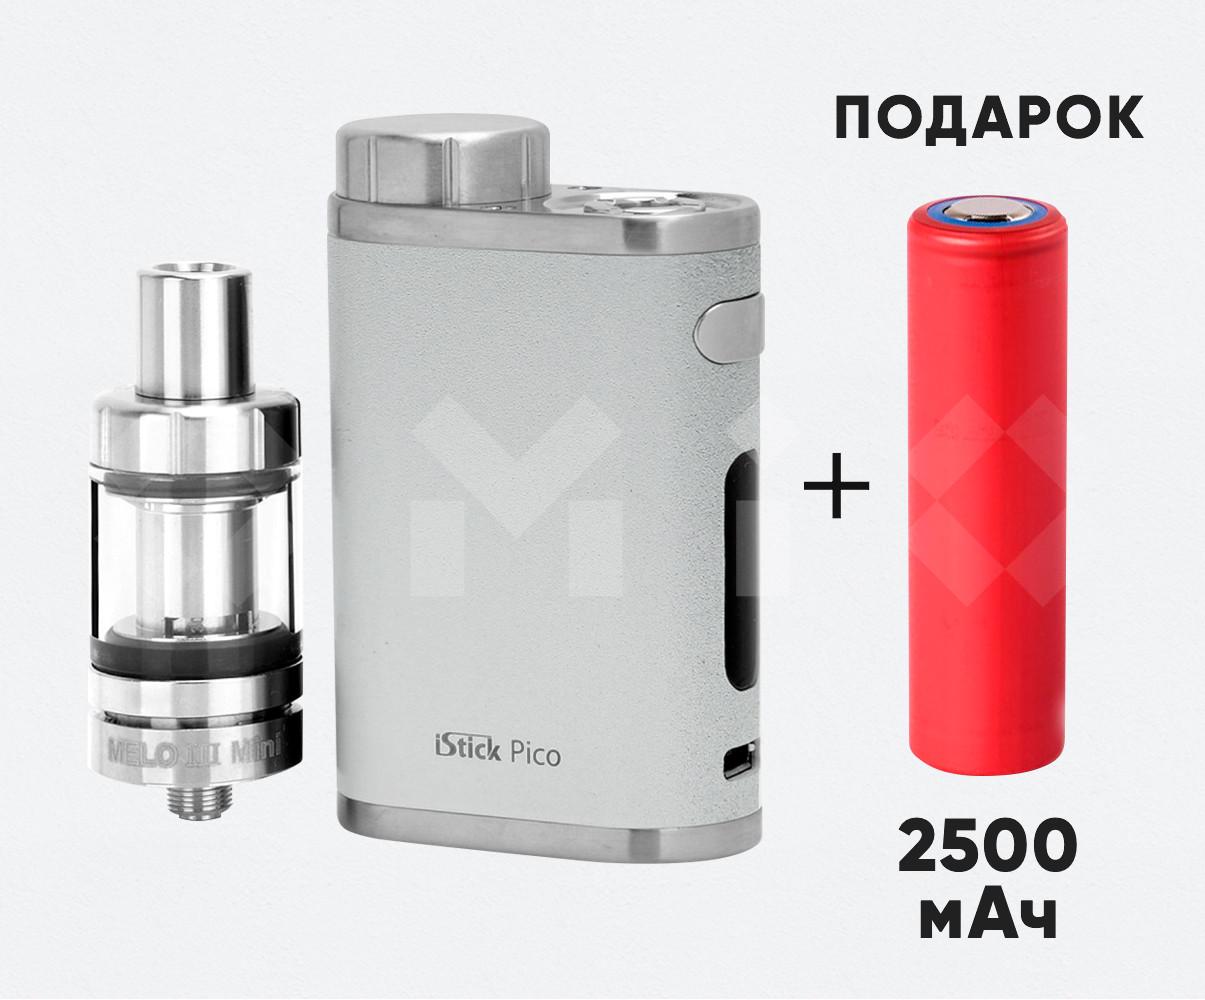 Eleaf iStick Pico 75 w ( Вейп АйСтик Пико 75 Вт ) электронная сигарета серебристого цвета (реплика)